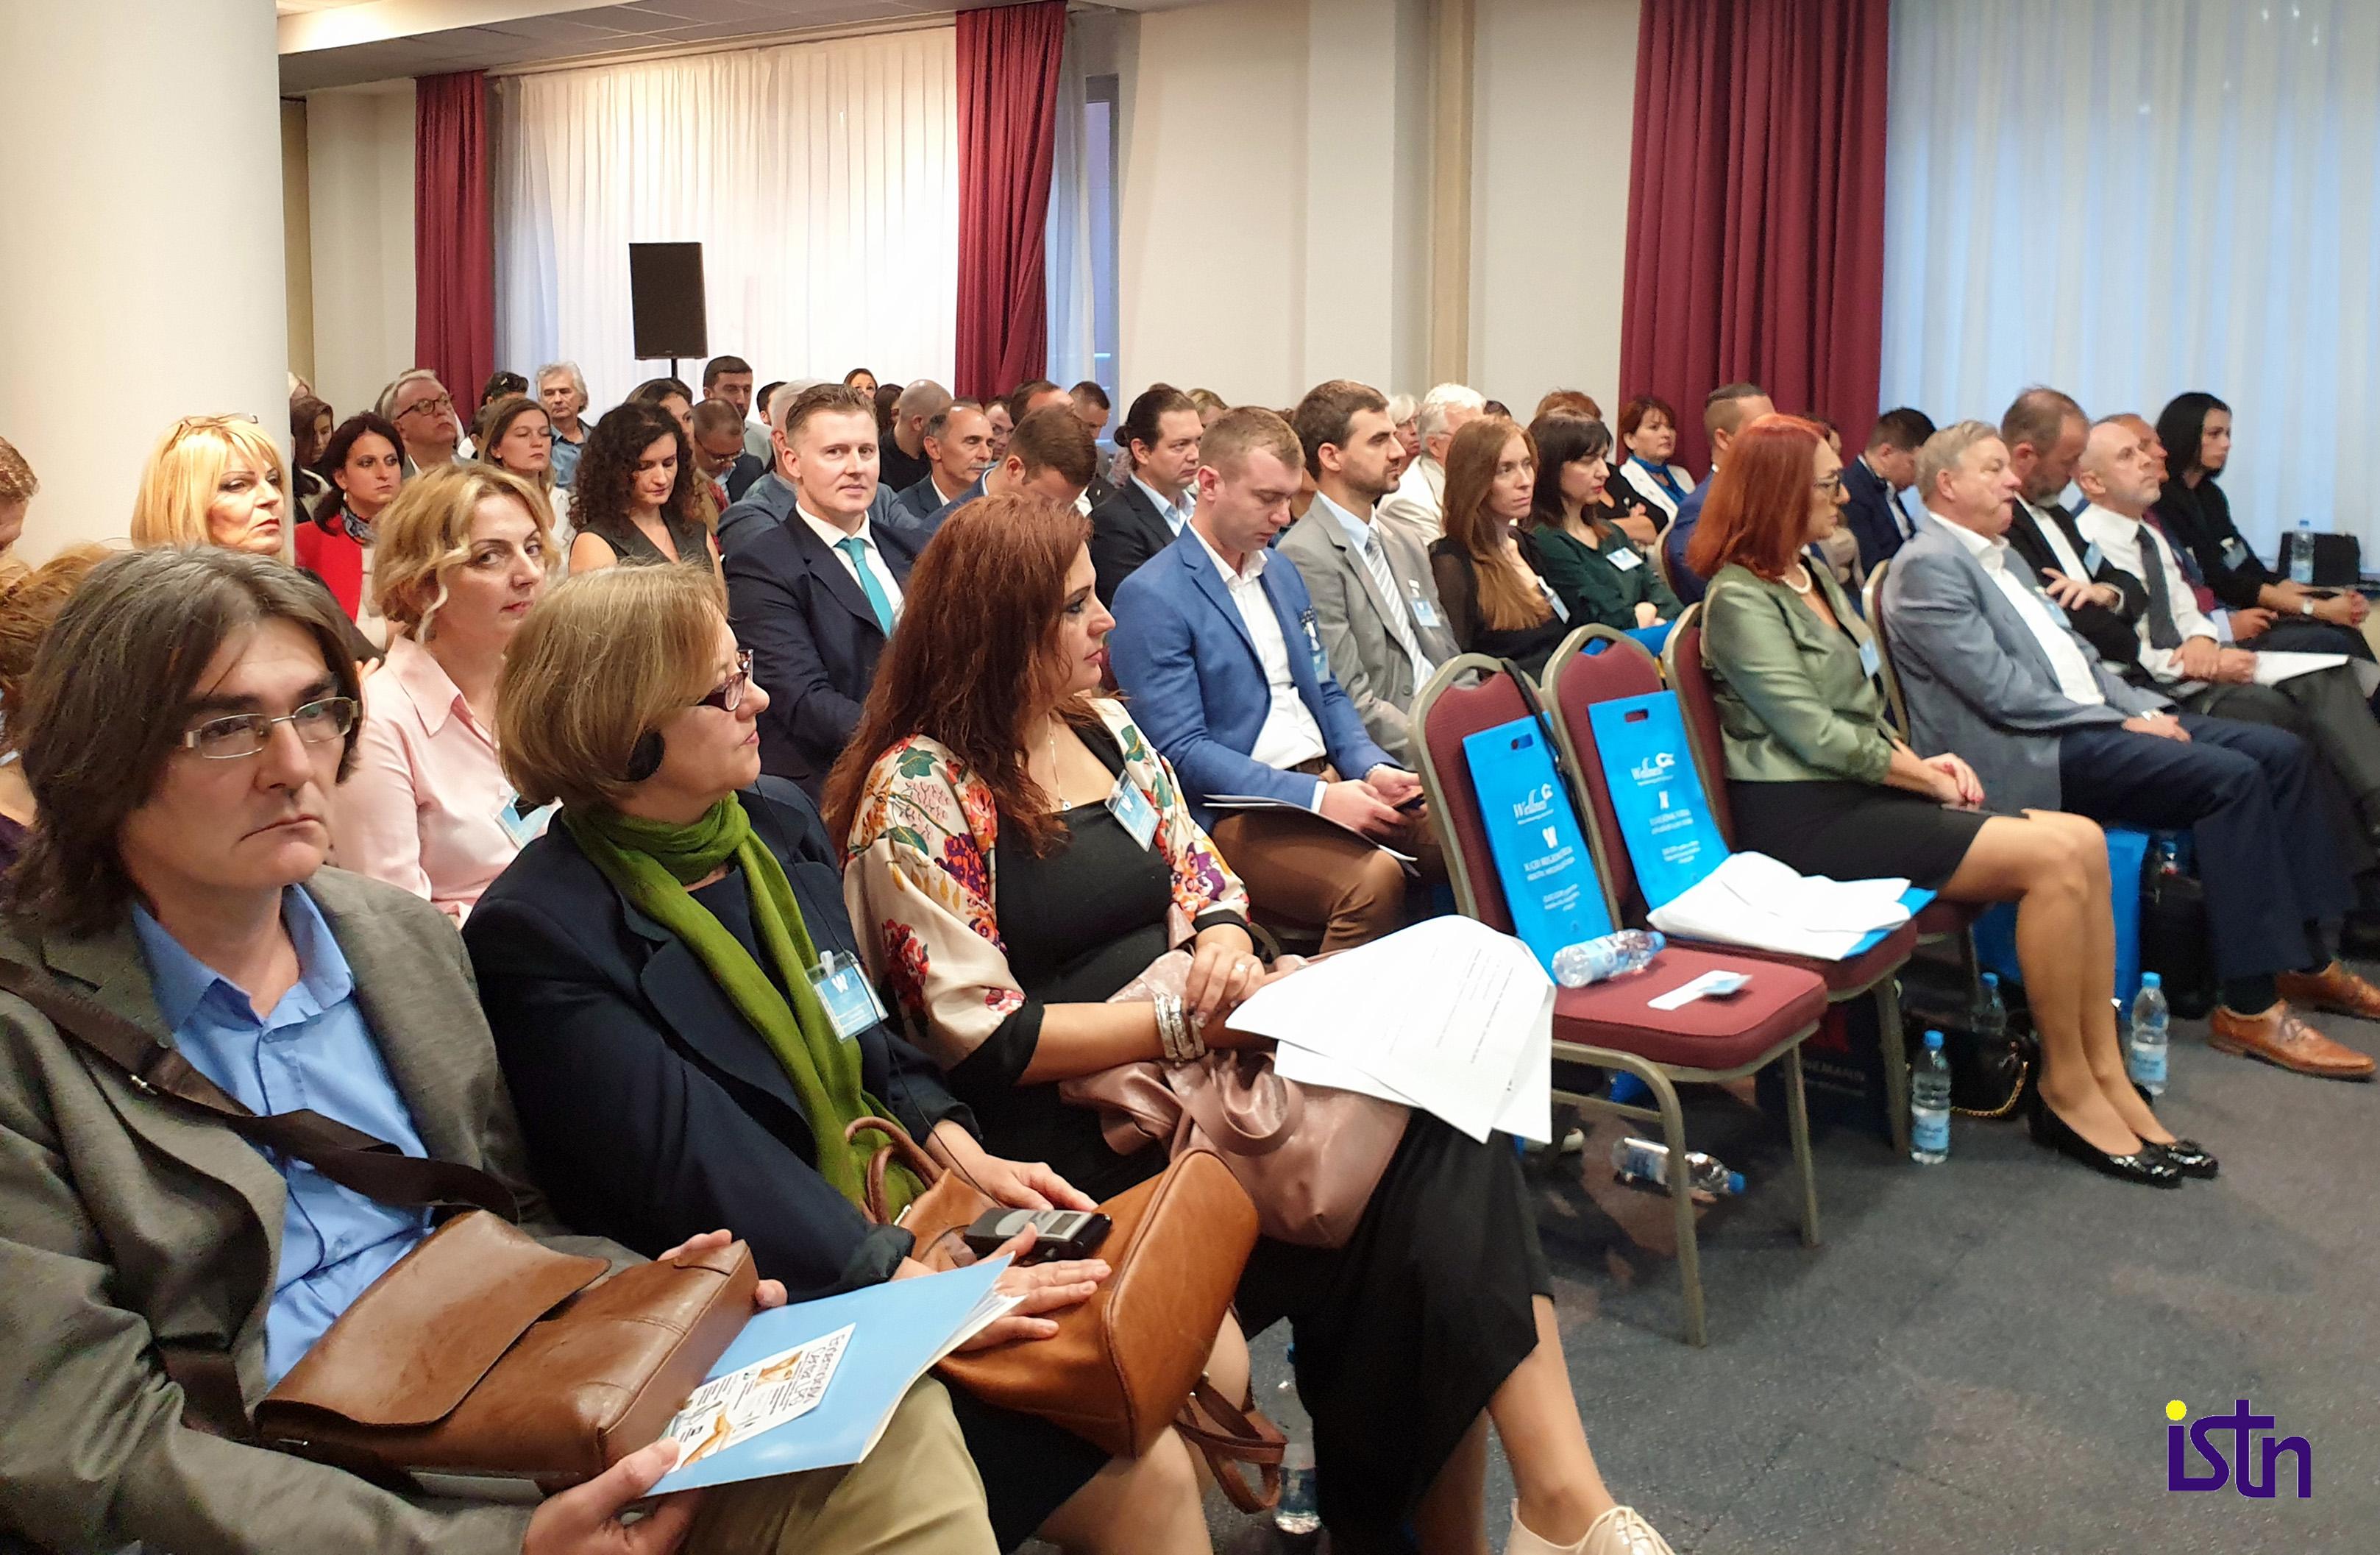 X CEI Regionalni forum wellness&spa turizma, ucesnici, ISTN